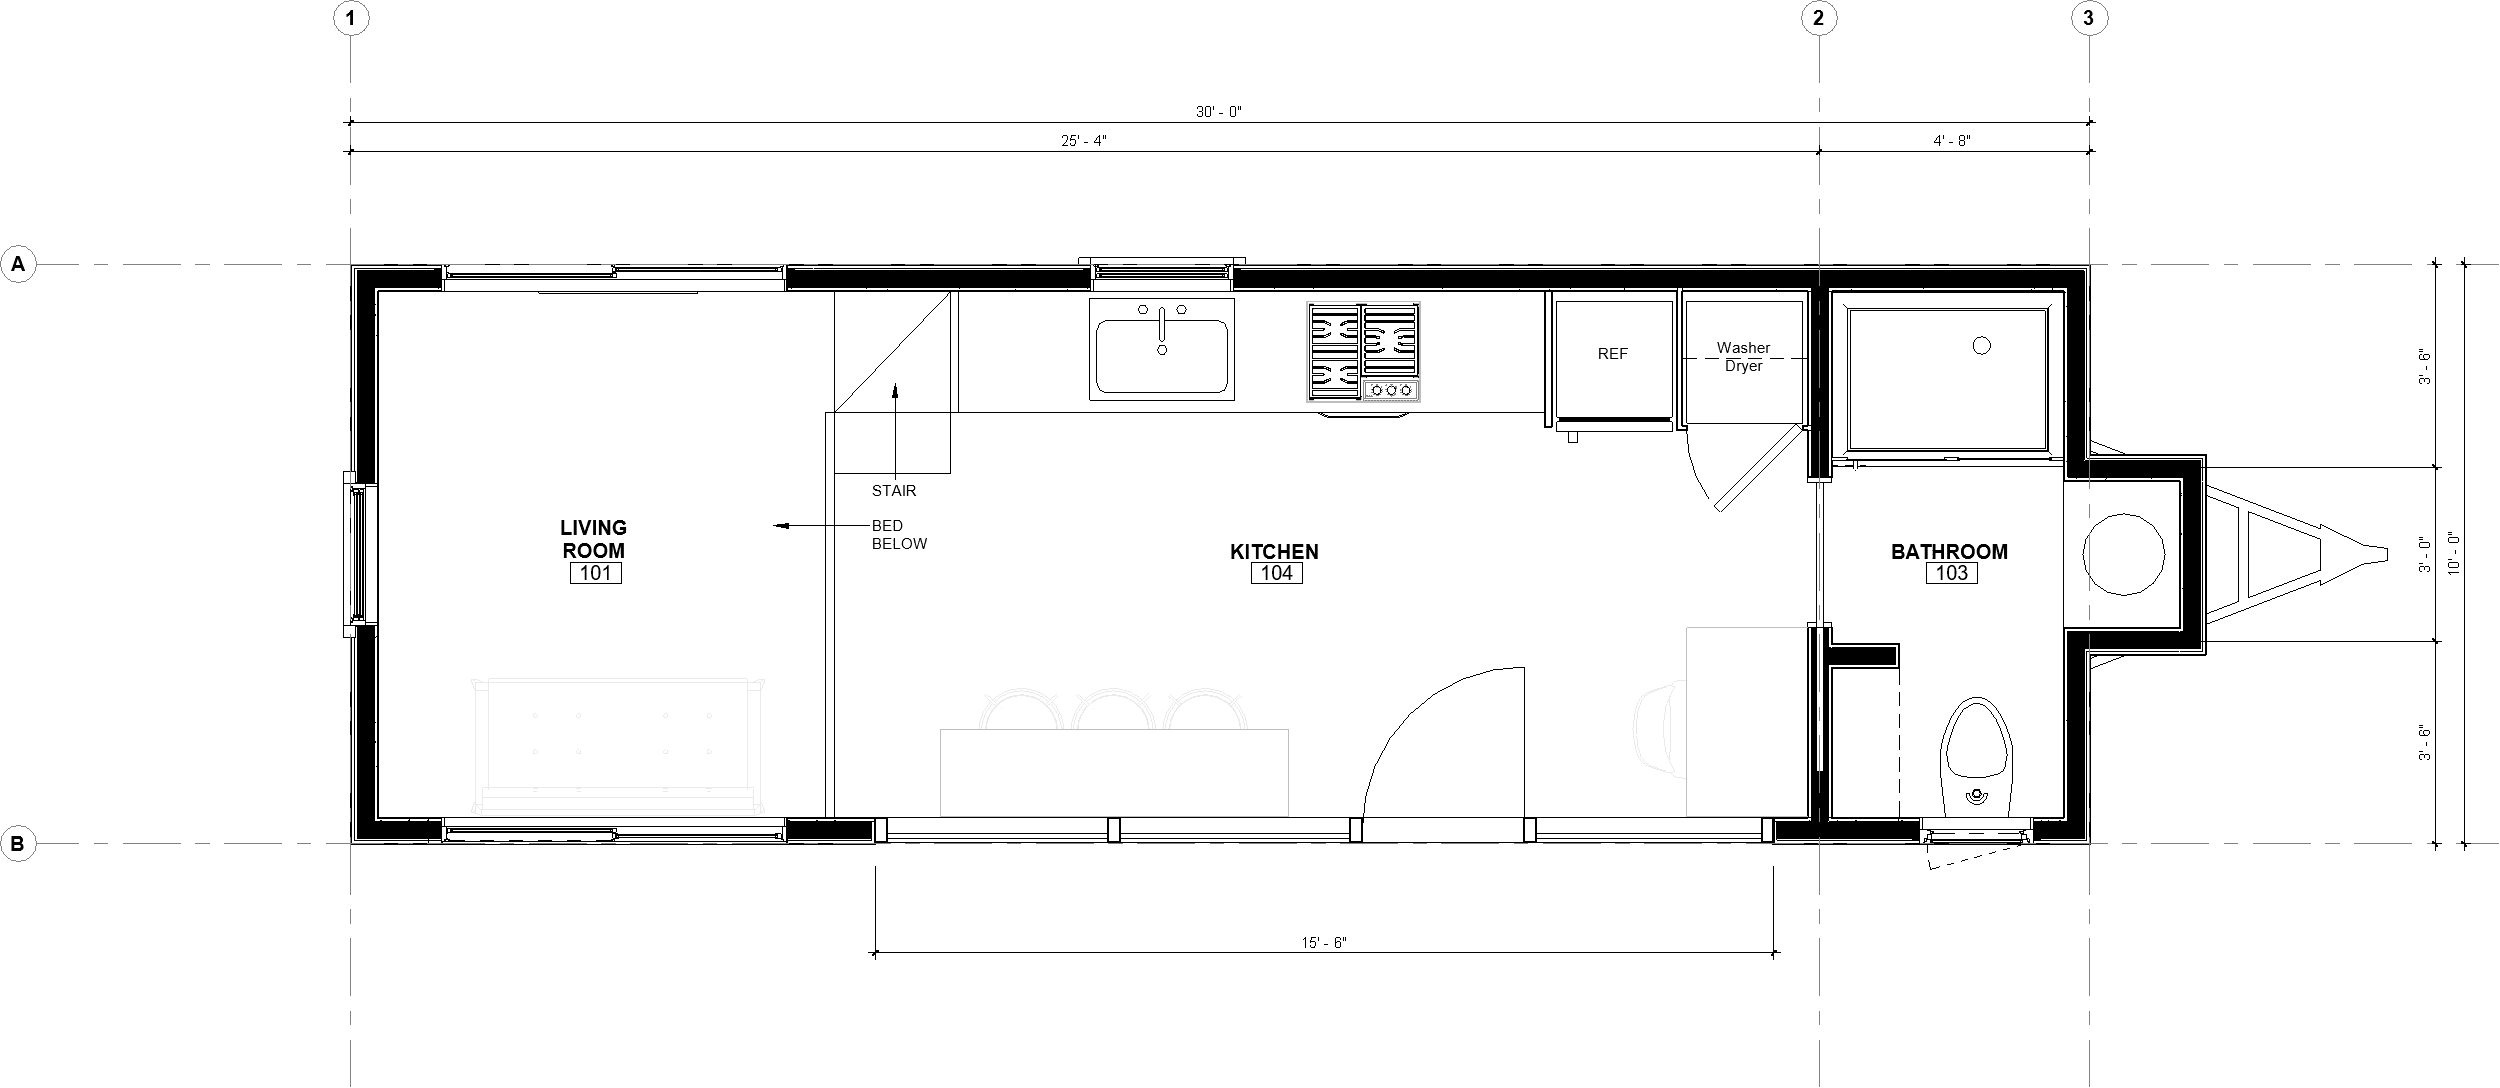 30ft Reverse Loft Pingora floor plan with dimensions